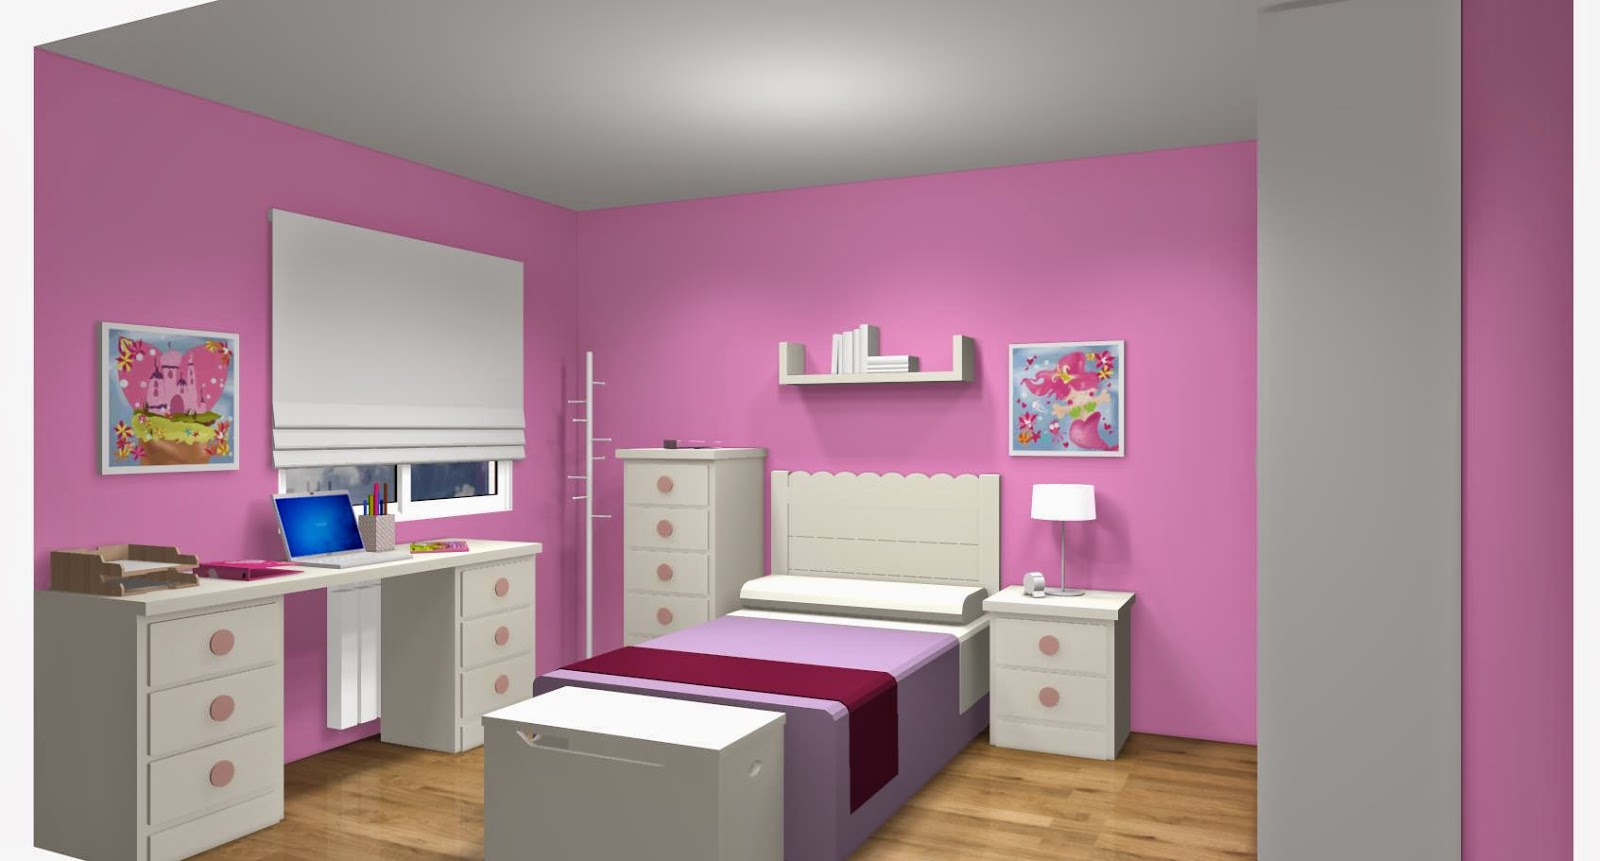 Dise o de cuartos o dormitorios juveniles for Muebles para habitaciones juveniles